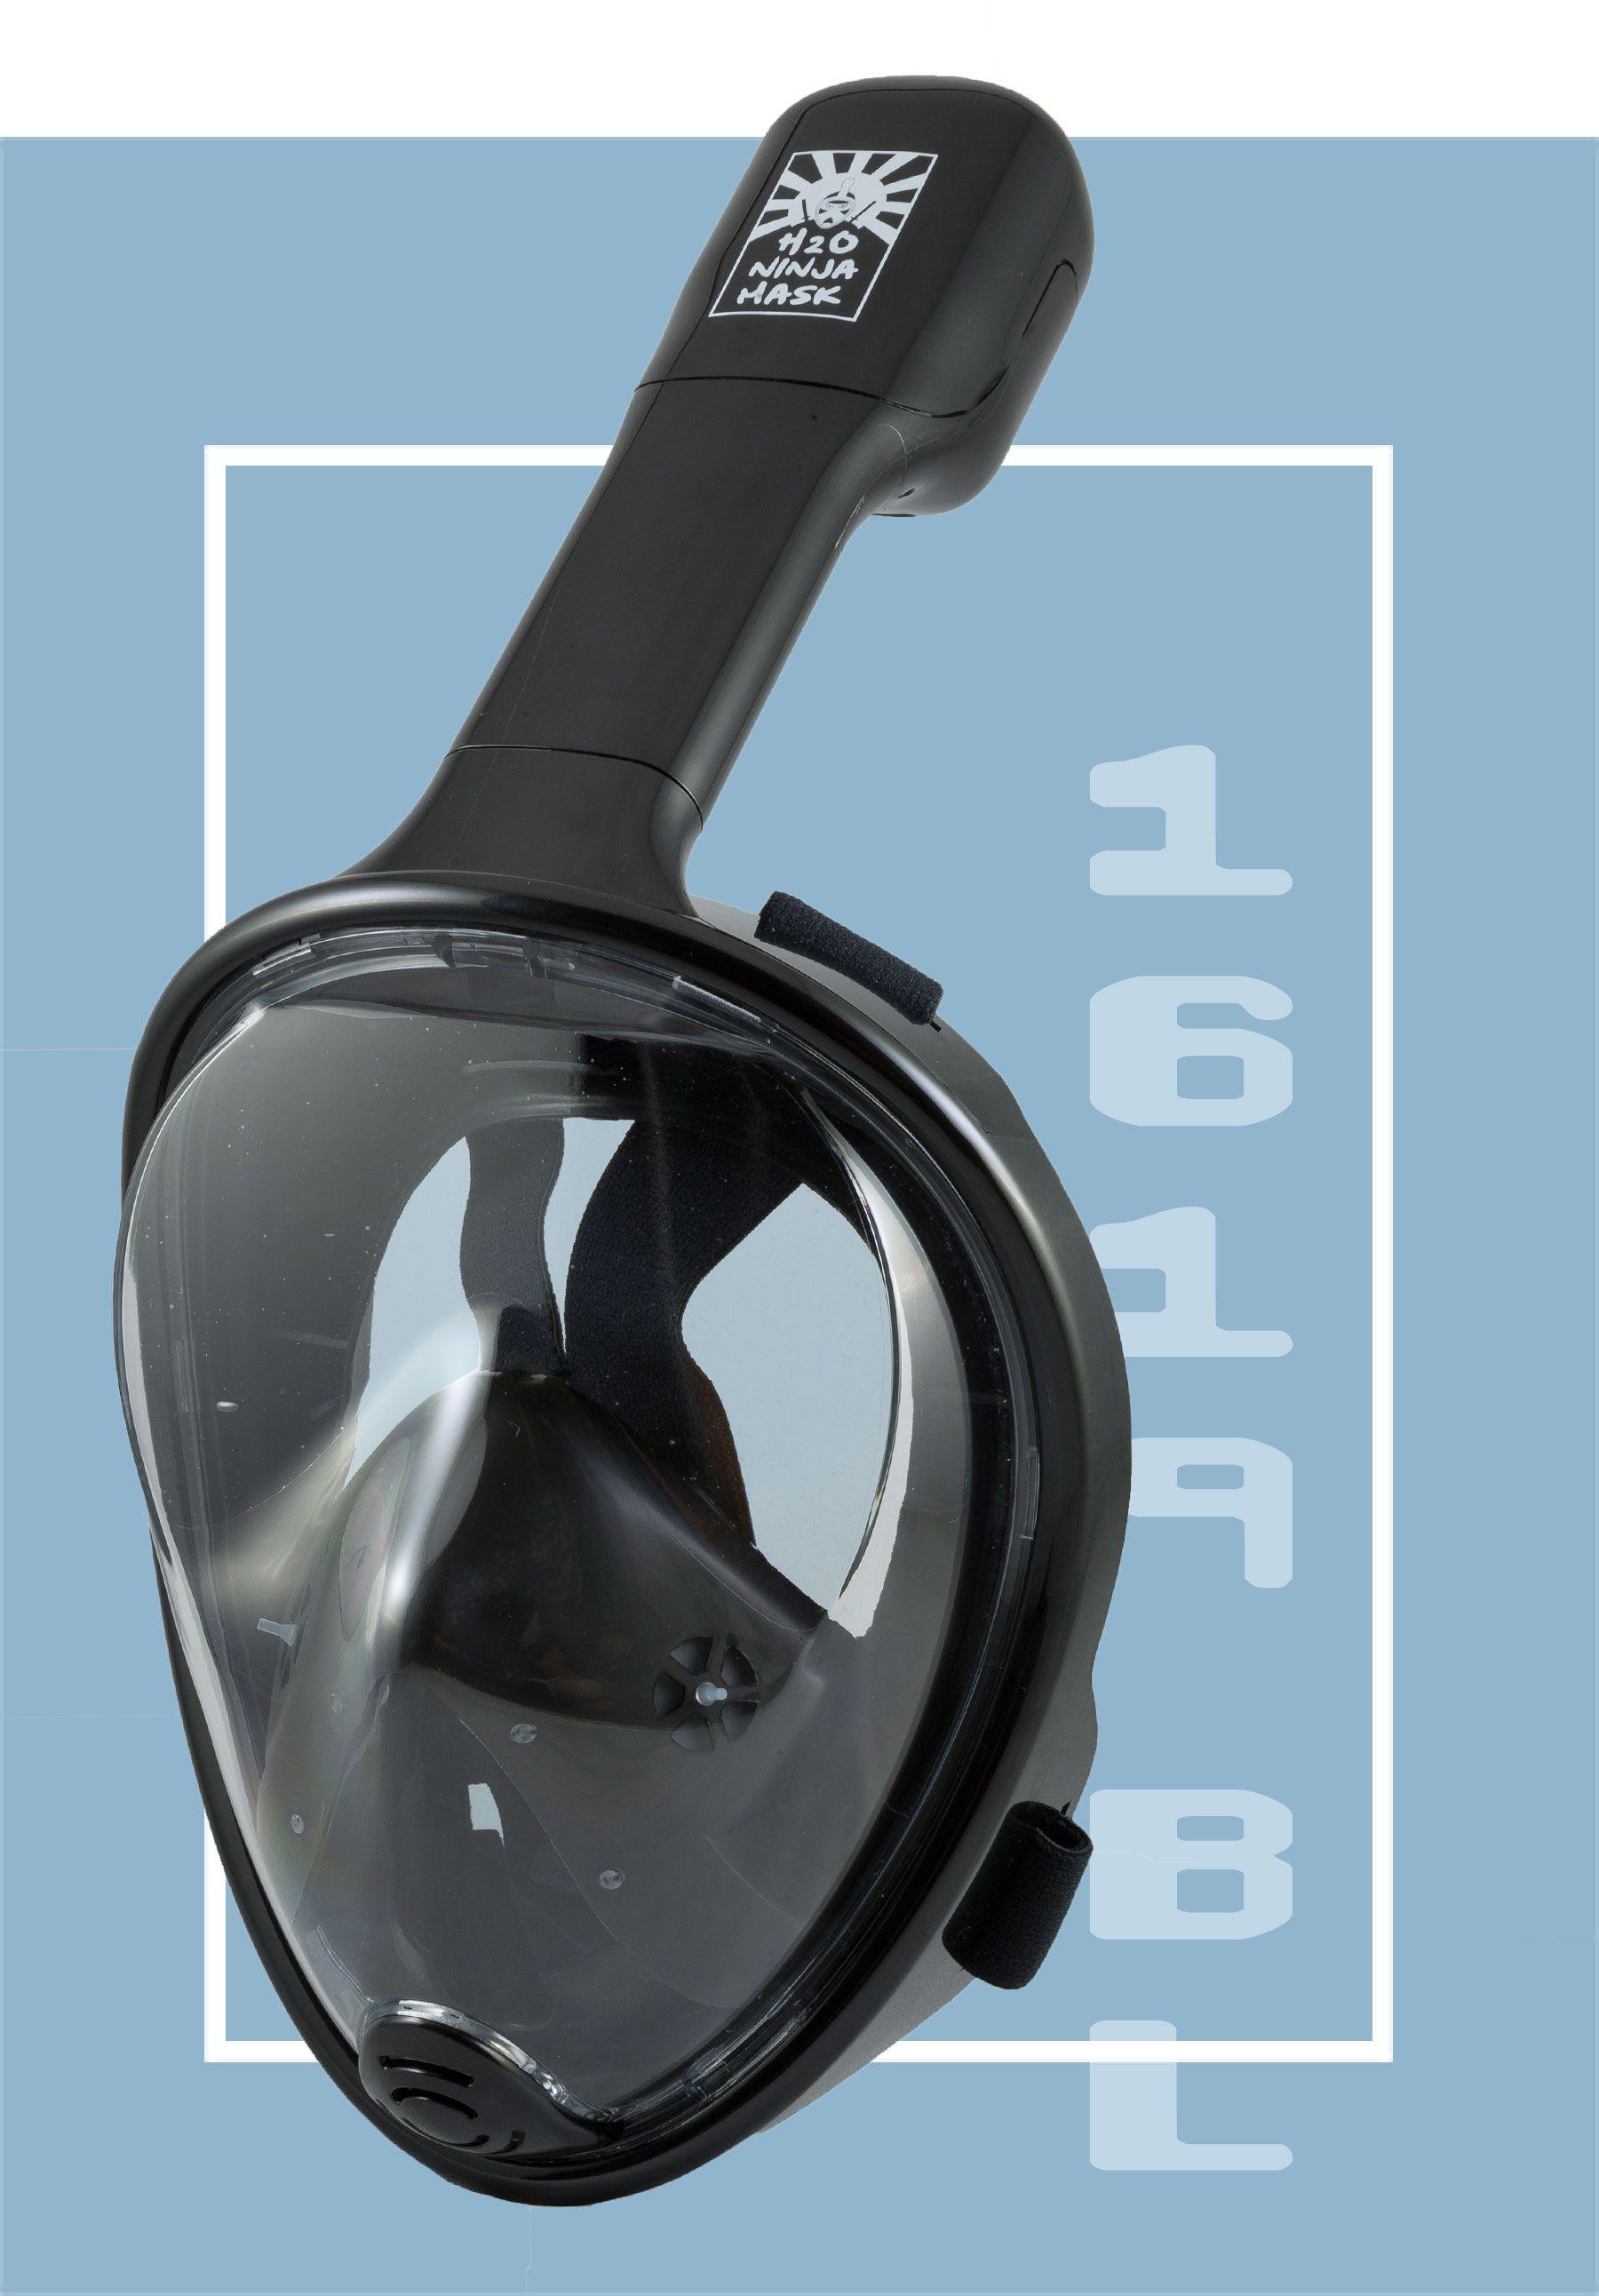 Full Face Snorkel Mask – H2O Ninja Mask Black